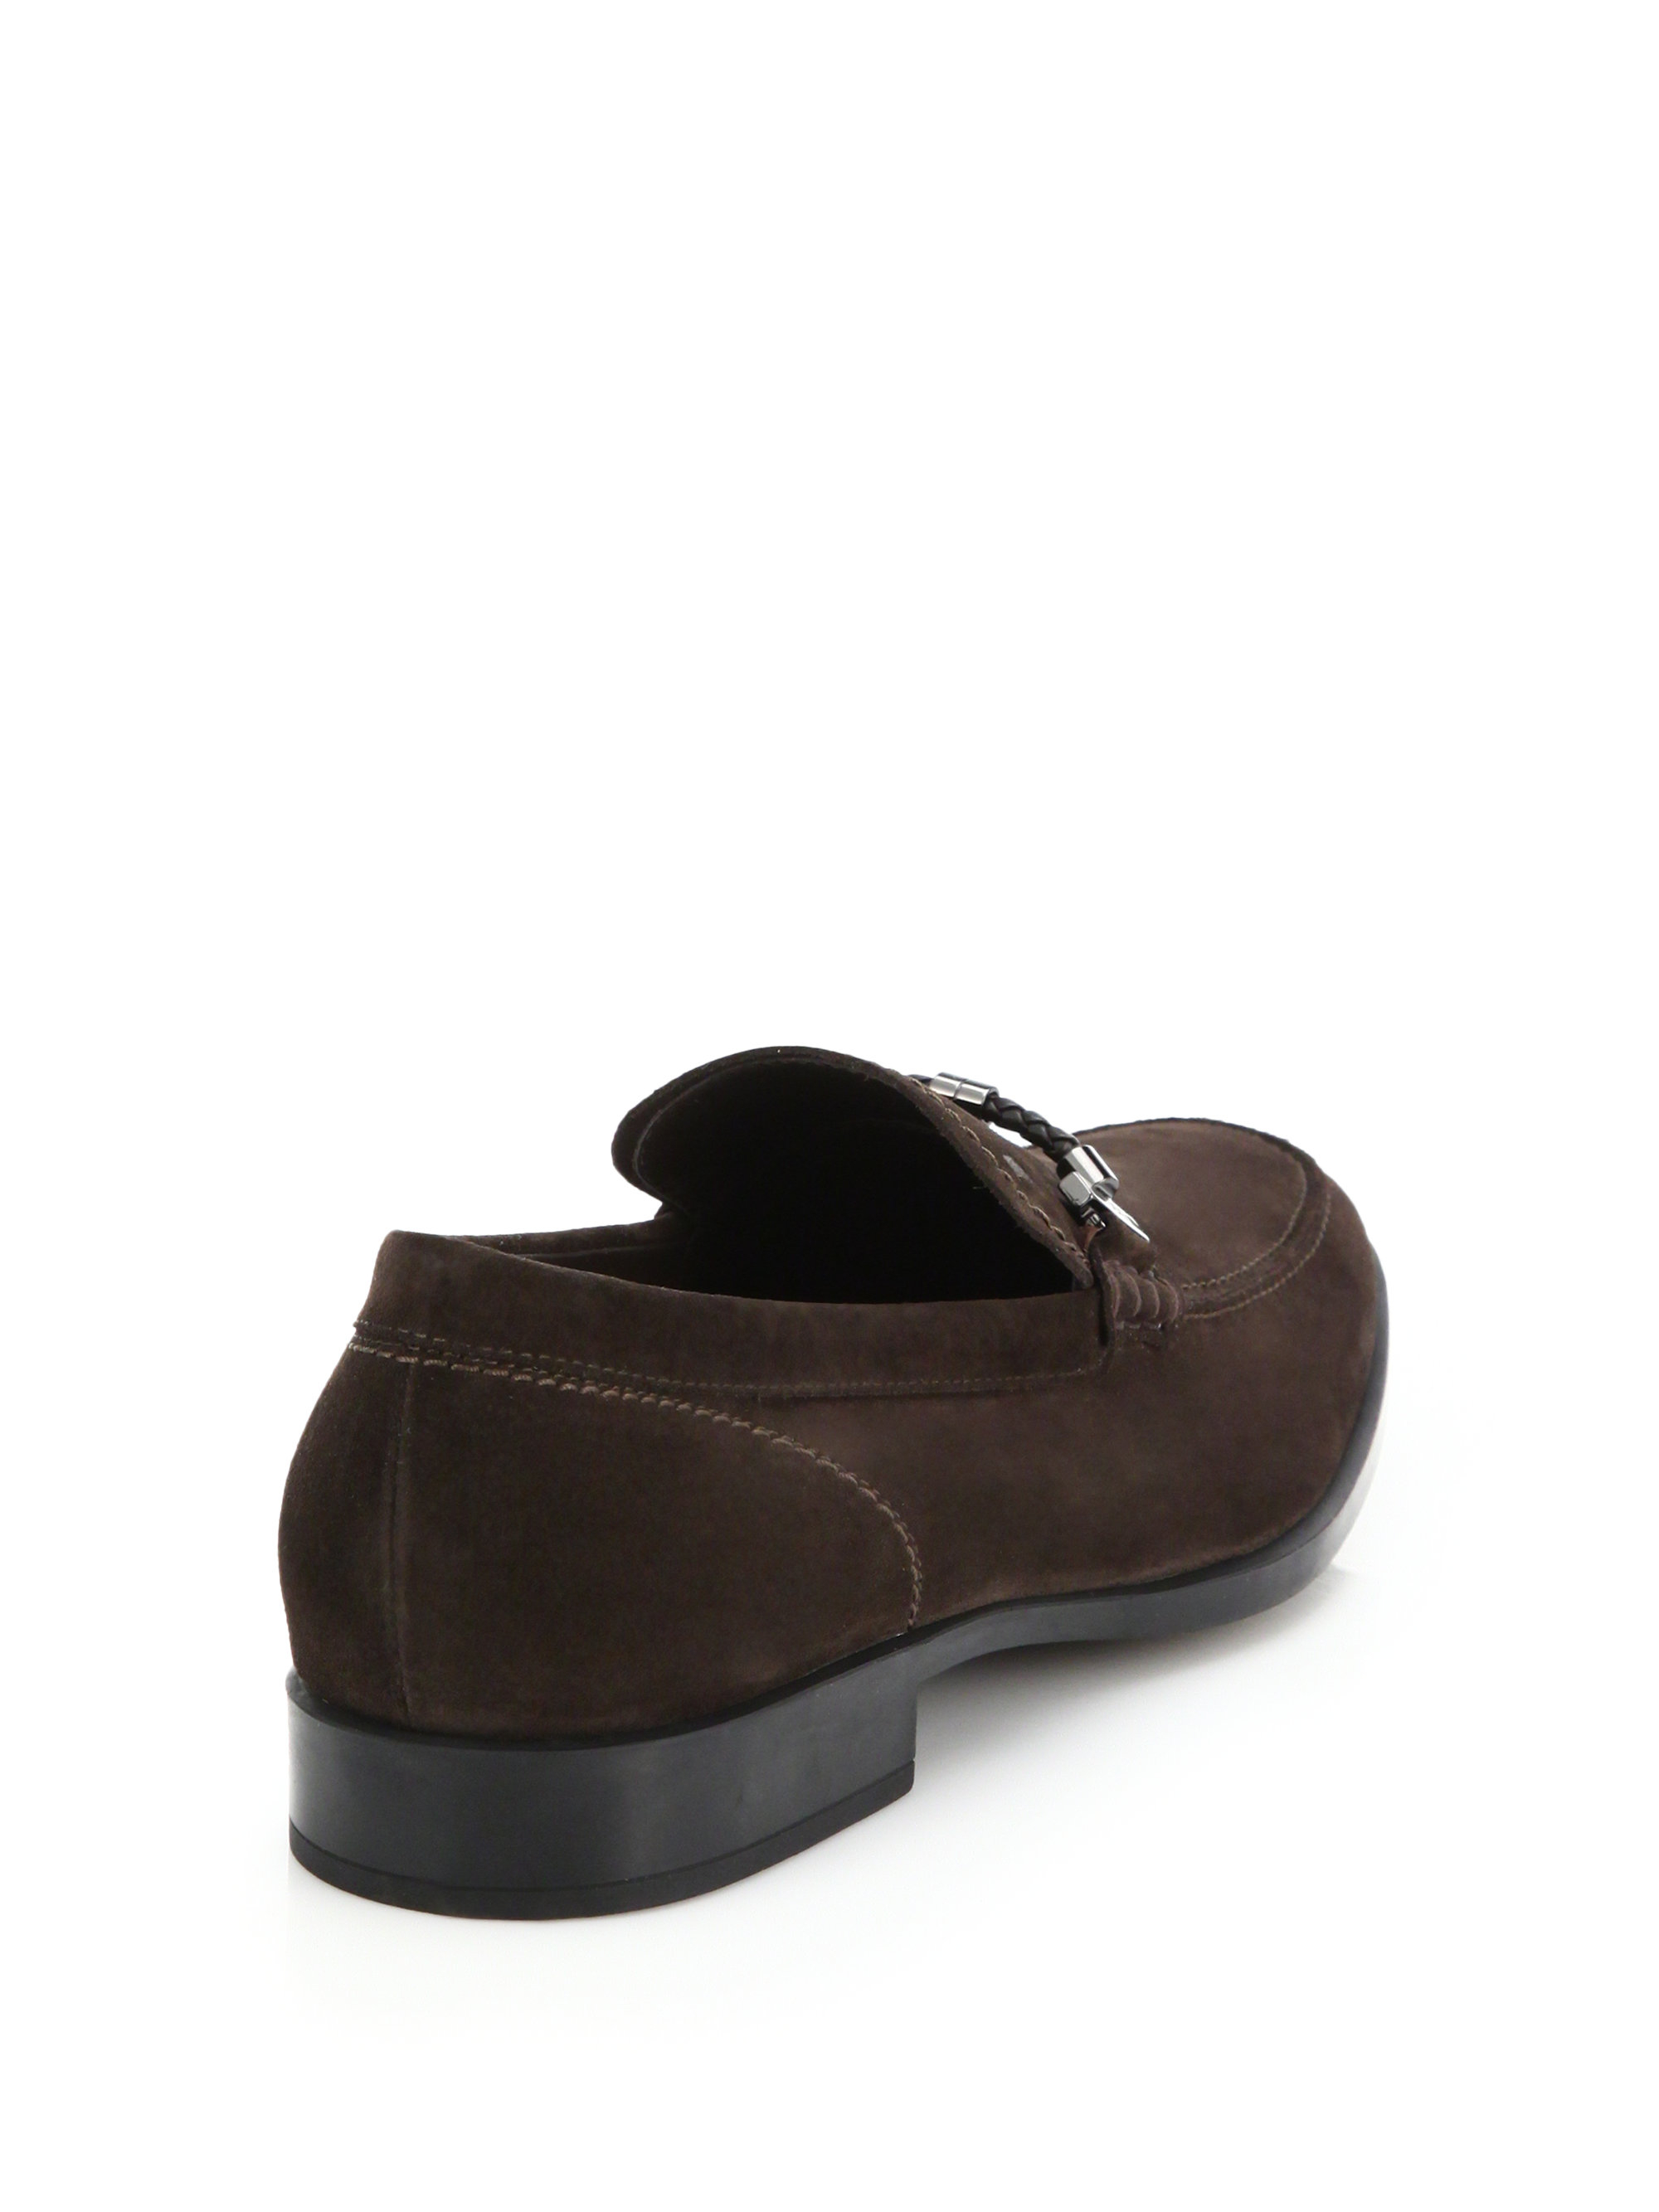 Black Suede Loafers For 28 Images Gravati Black Suede